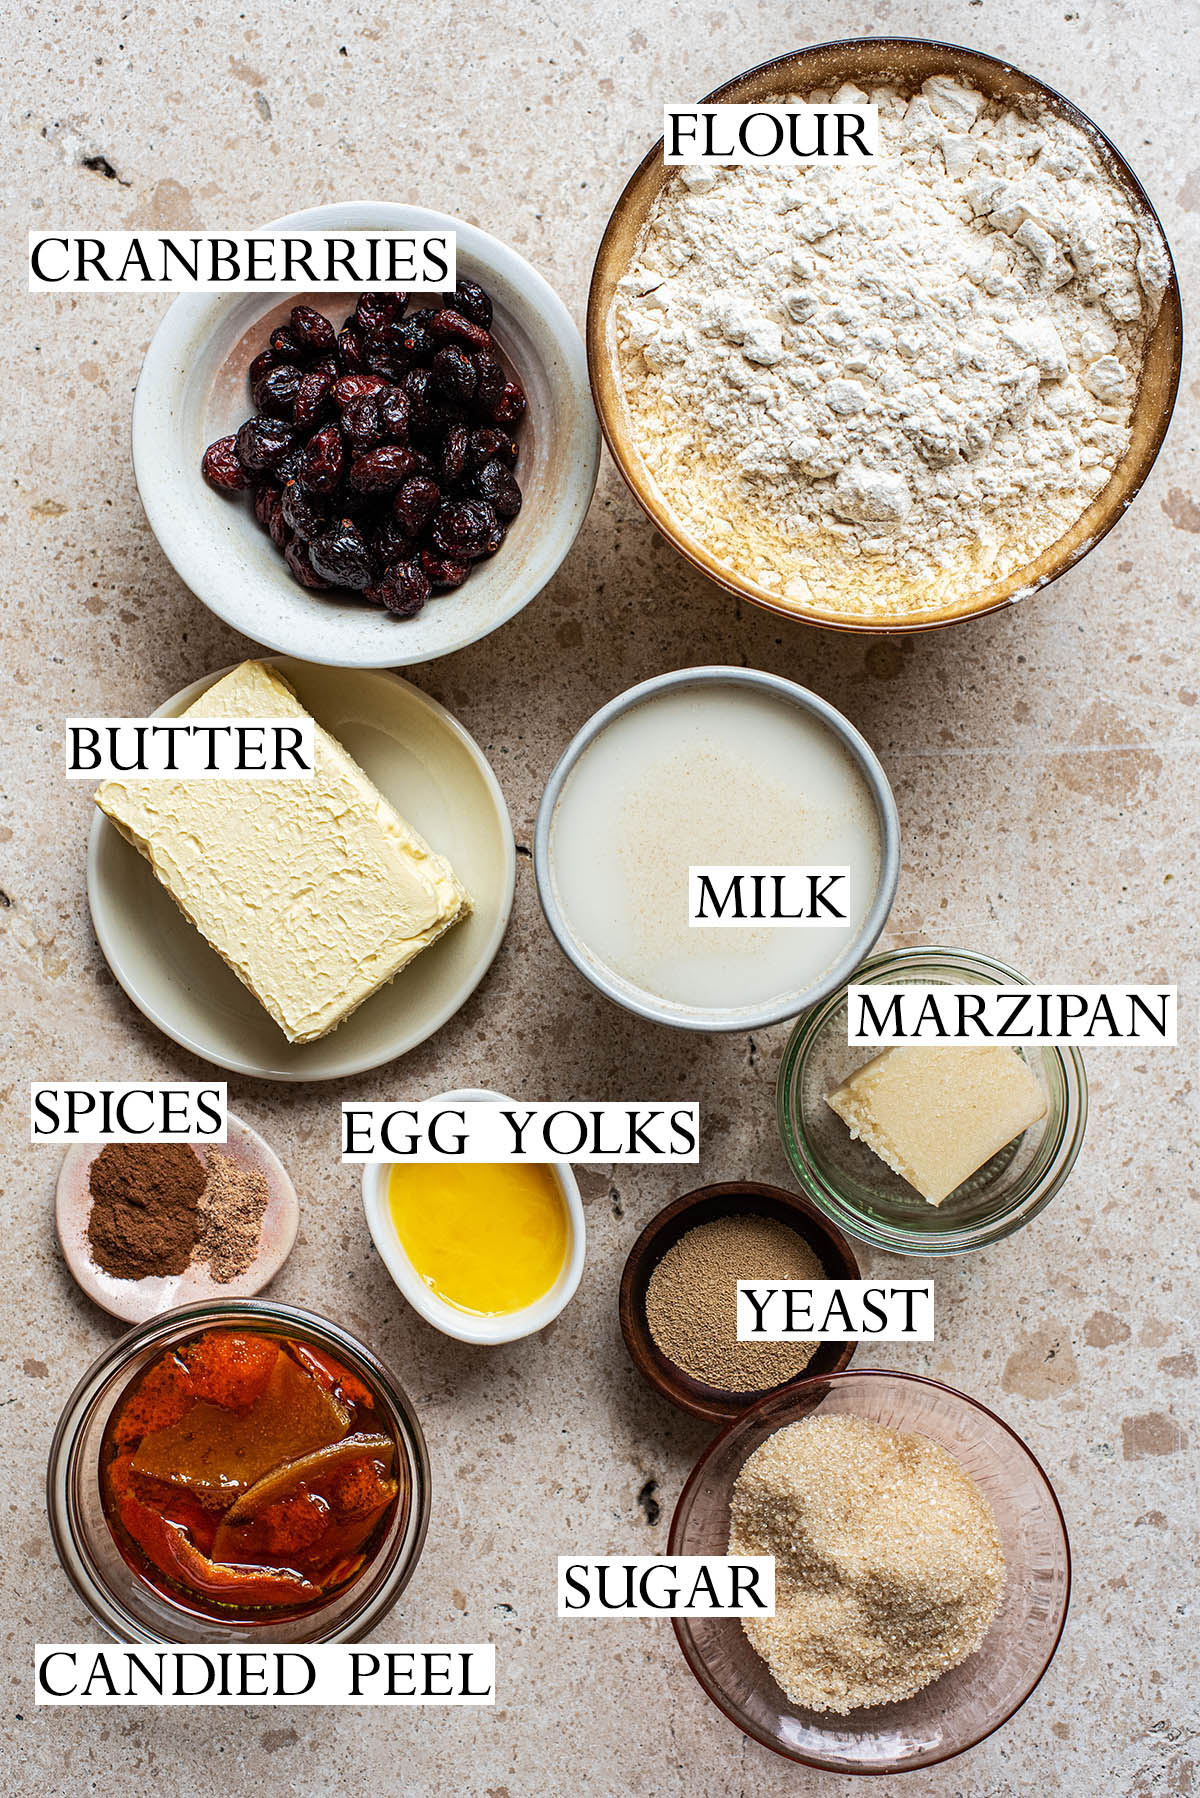 Cranberry marzipan stollen ingredients.